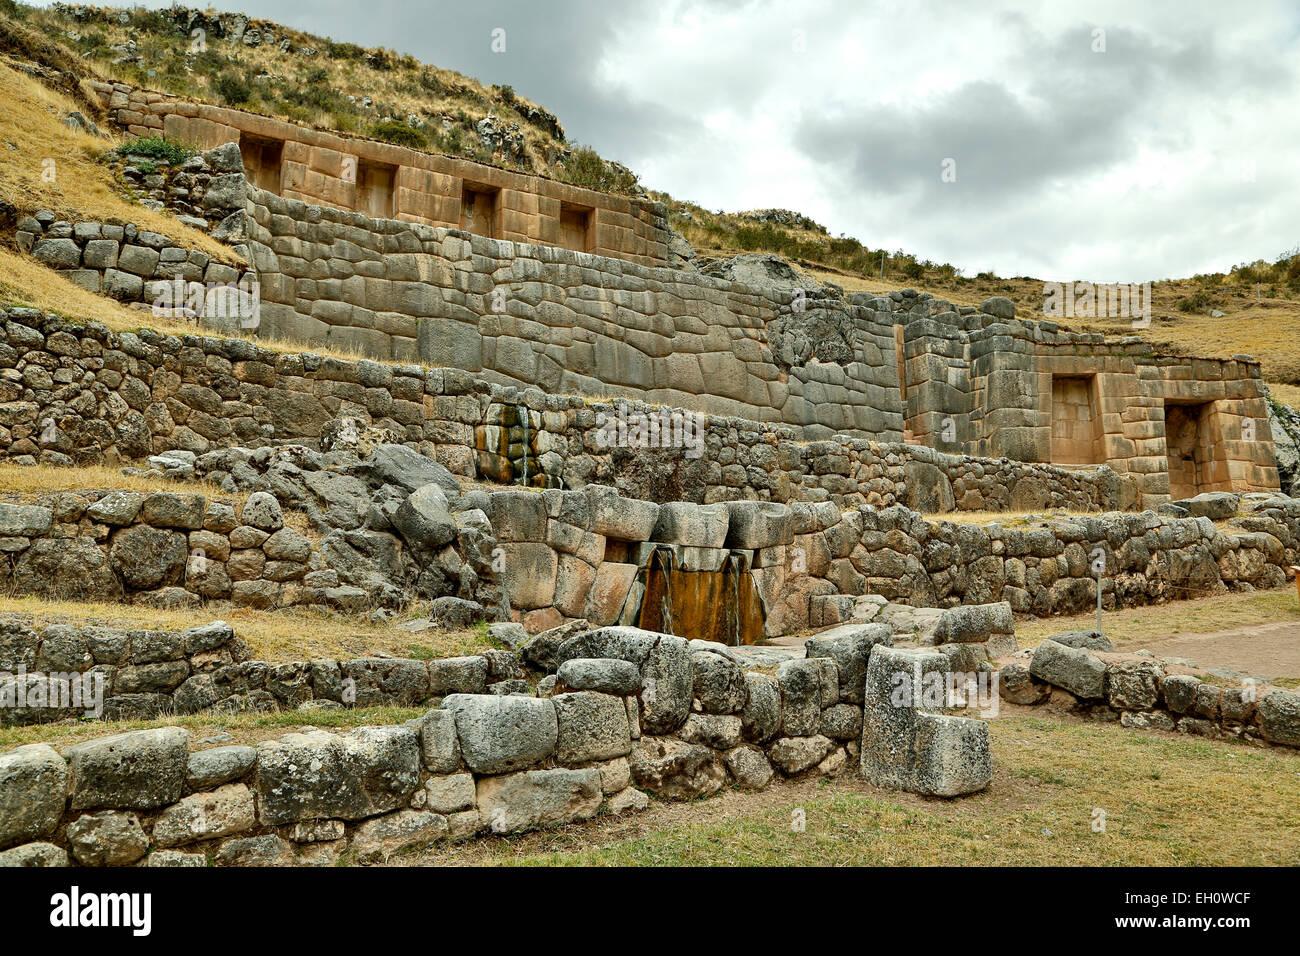 Vista generale di Tambomachay rovine Inca, Cusco, Perù Immagini Stock